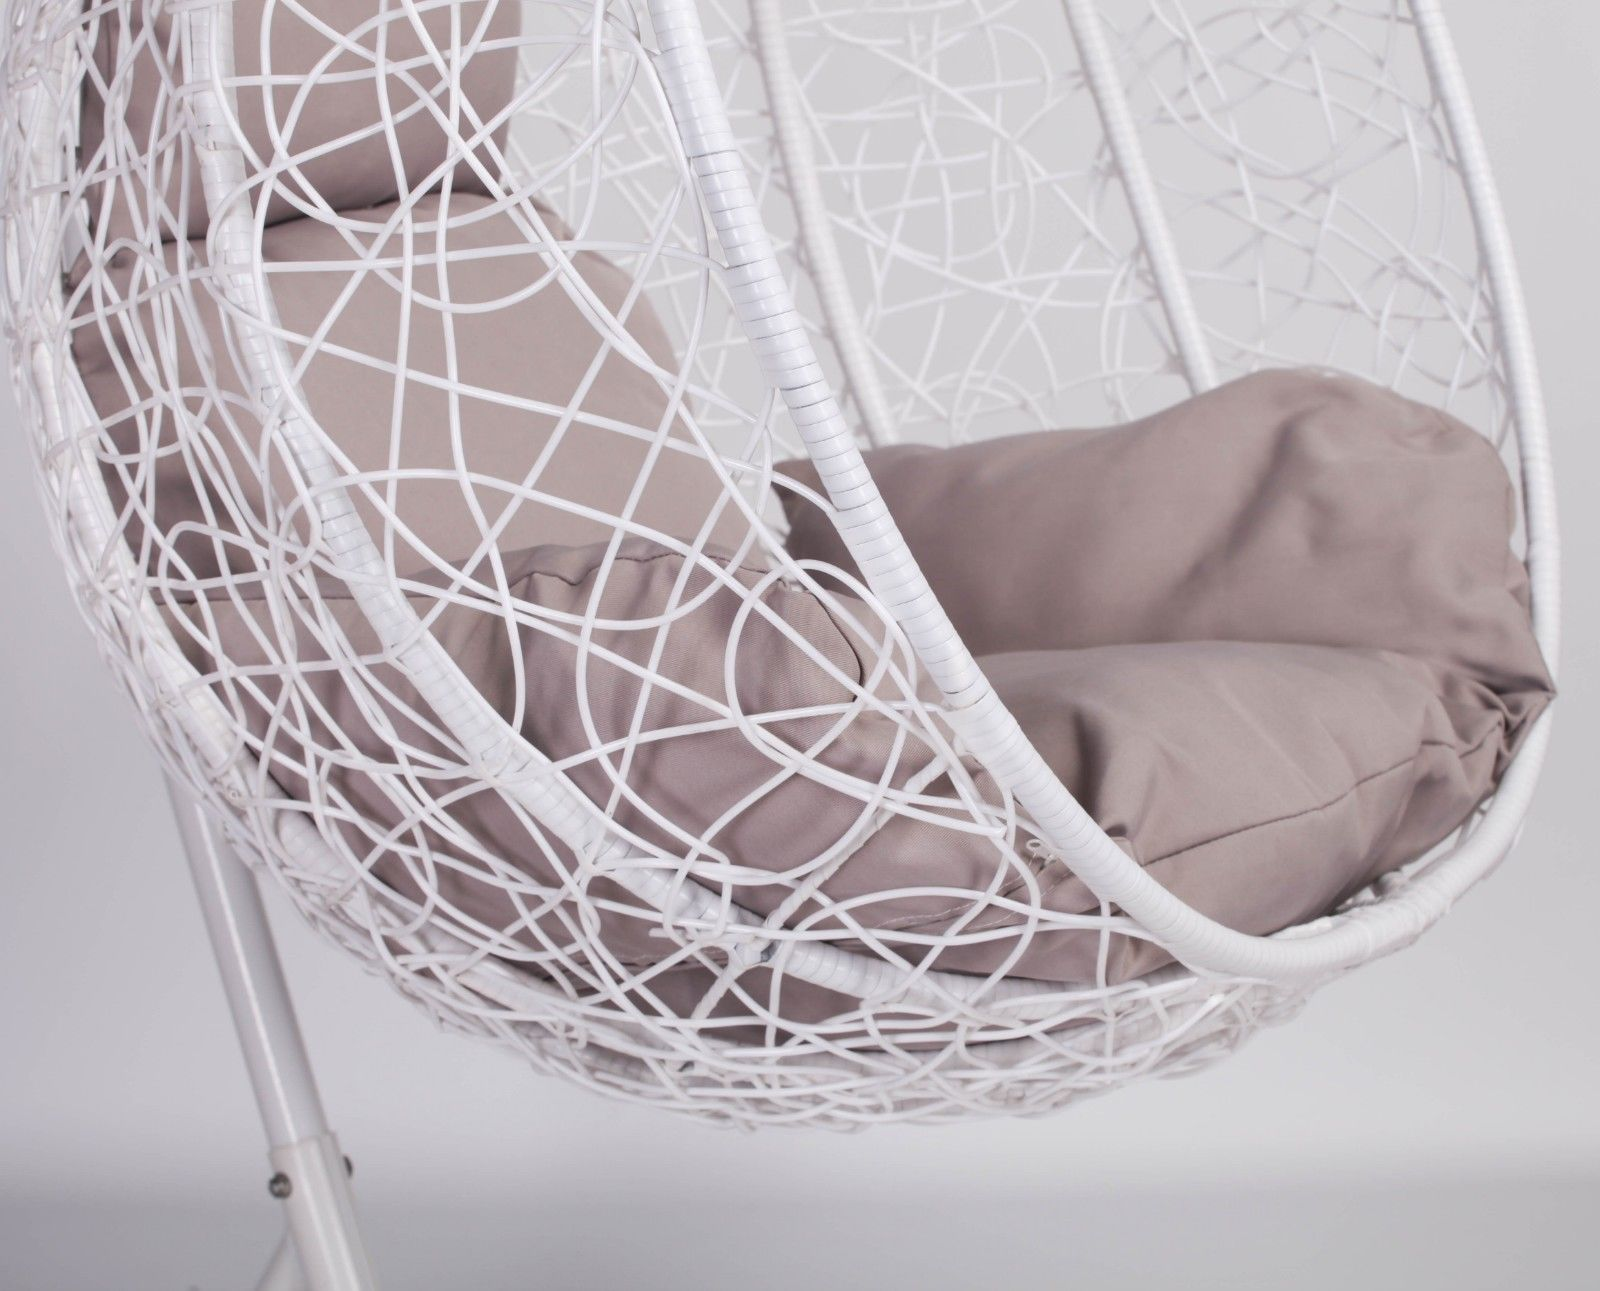 White Rattan Swing Weave Patio Garden Hanging Egg Chair Furniture La Maison Chic Luxury Interiors